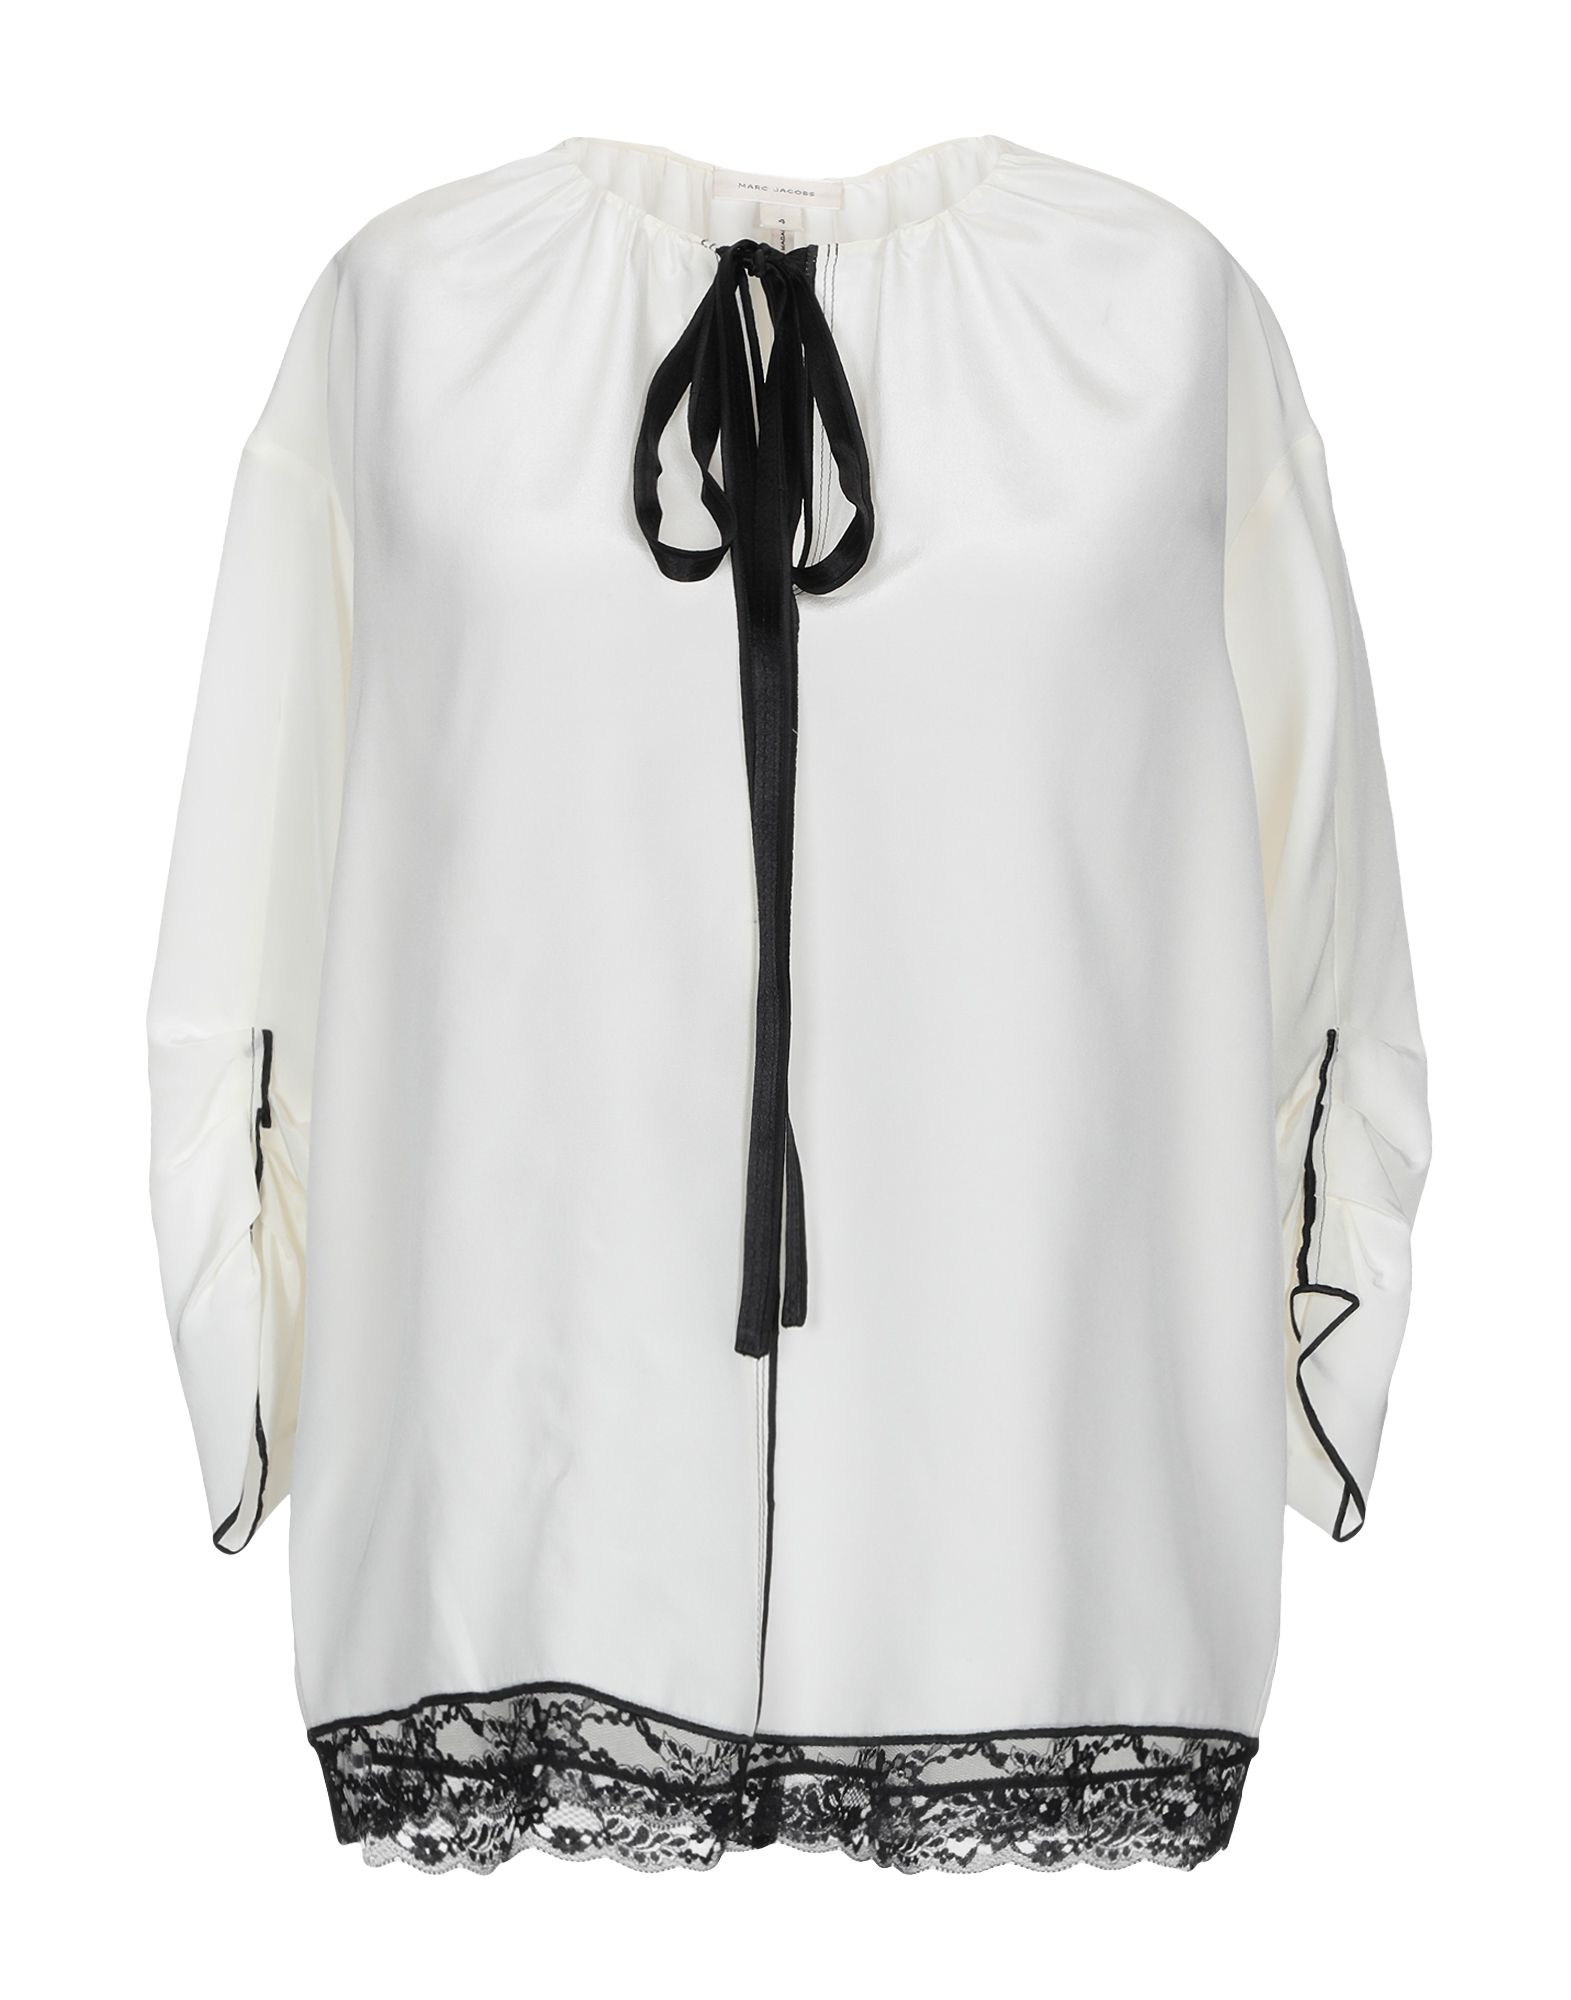 Фото - MARC JACOBS Блузка marc jacobs блузка